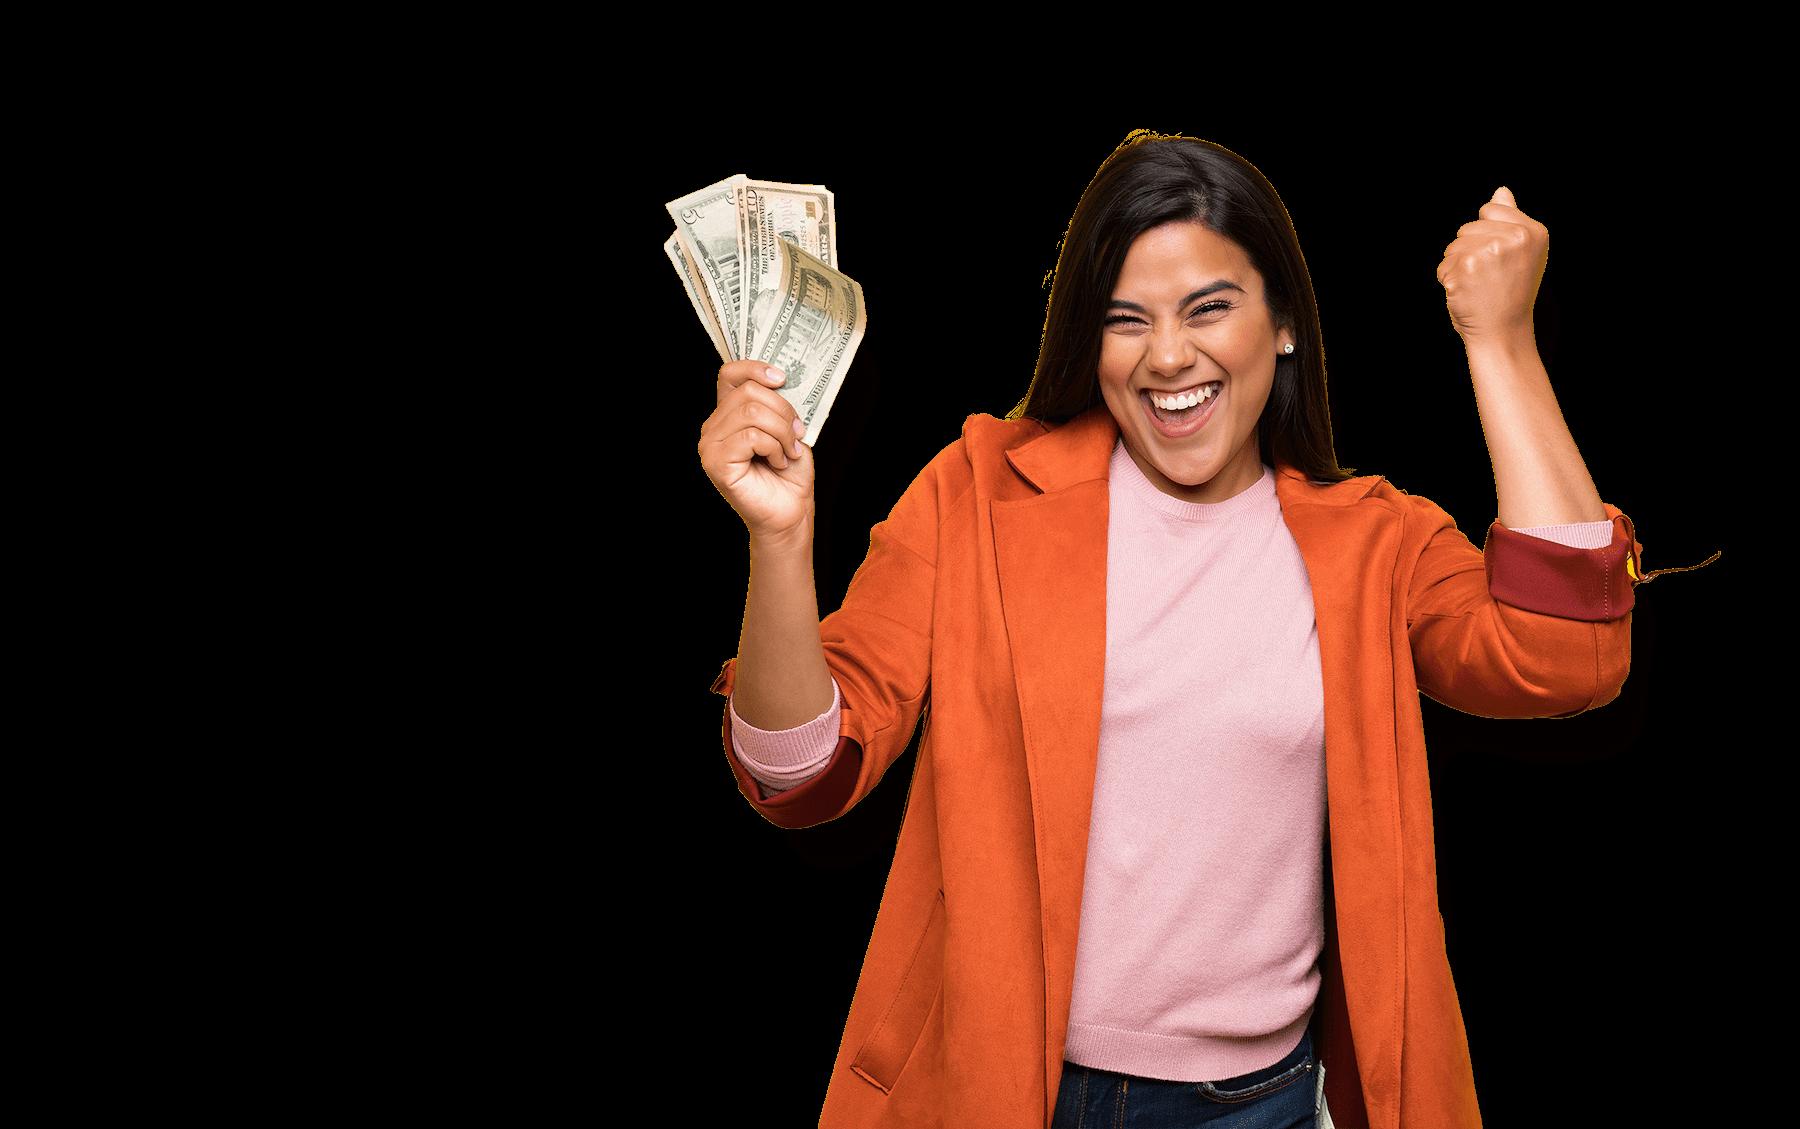 Girl Celebrating with Cash